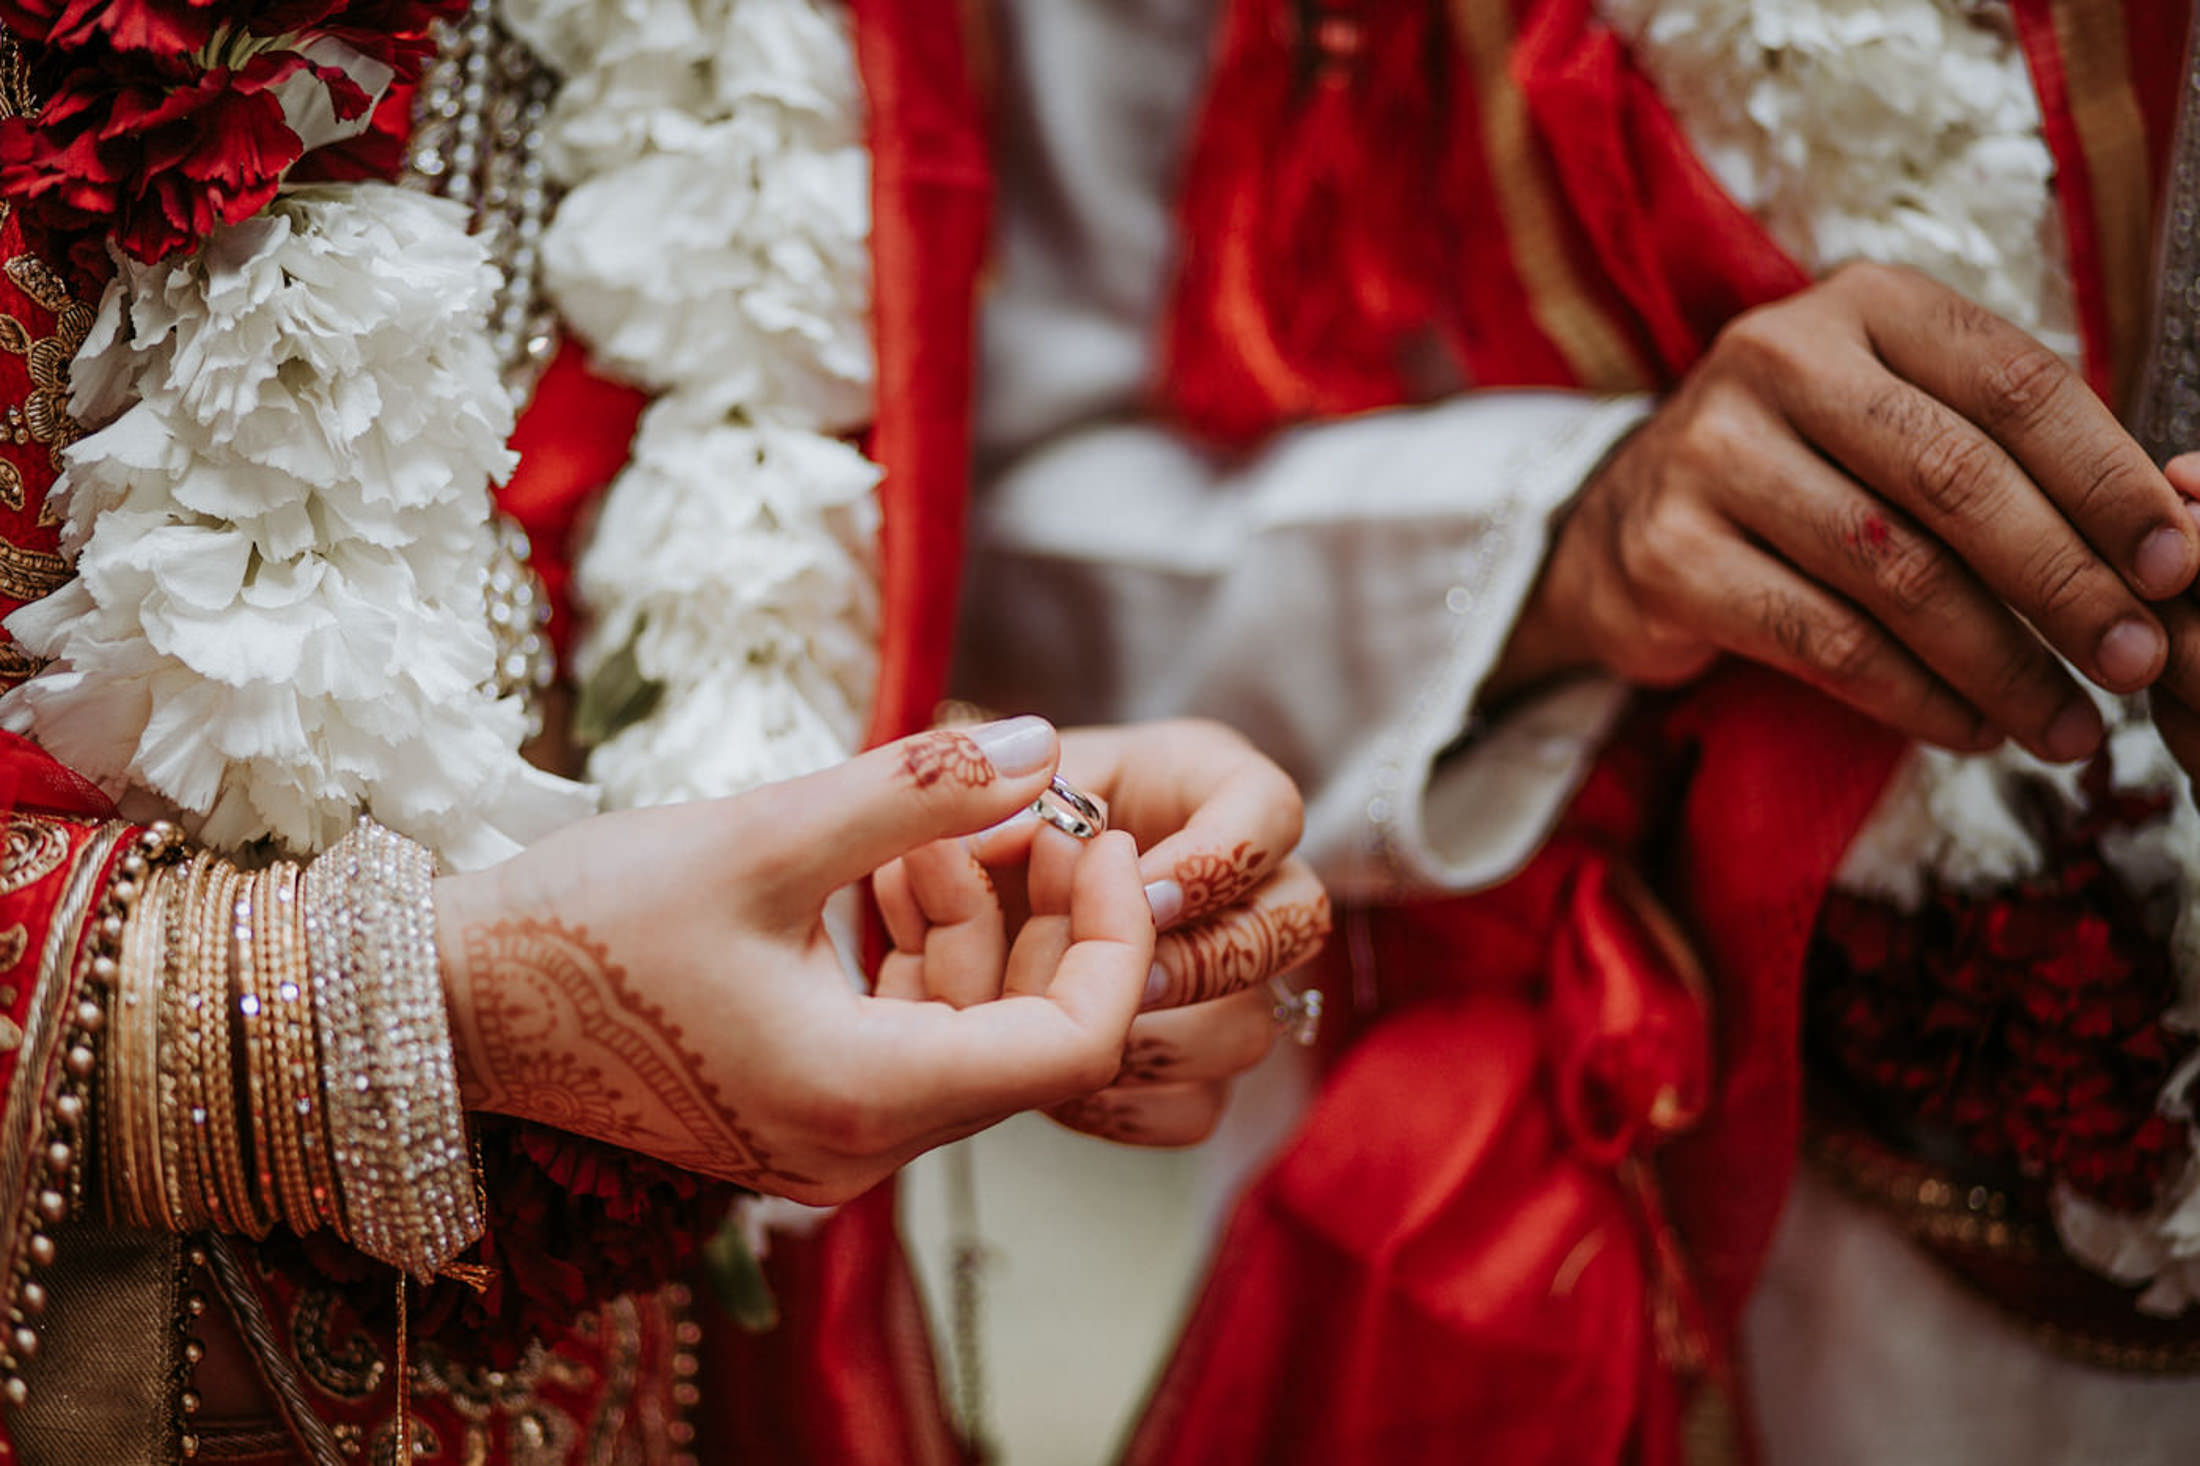 Wedding_Photographer_Mallorca_Daniela-Marquardt_Photography_New_York_Iceland_Tuscany_Santorini_Portugal_Austria_Bavaria_Elopement_Hochzeitsfotograf_AntjeRajat2_51